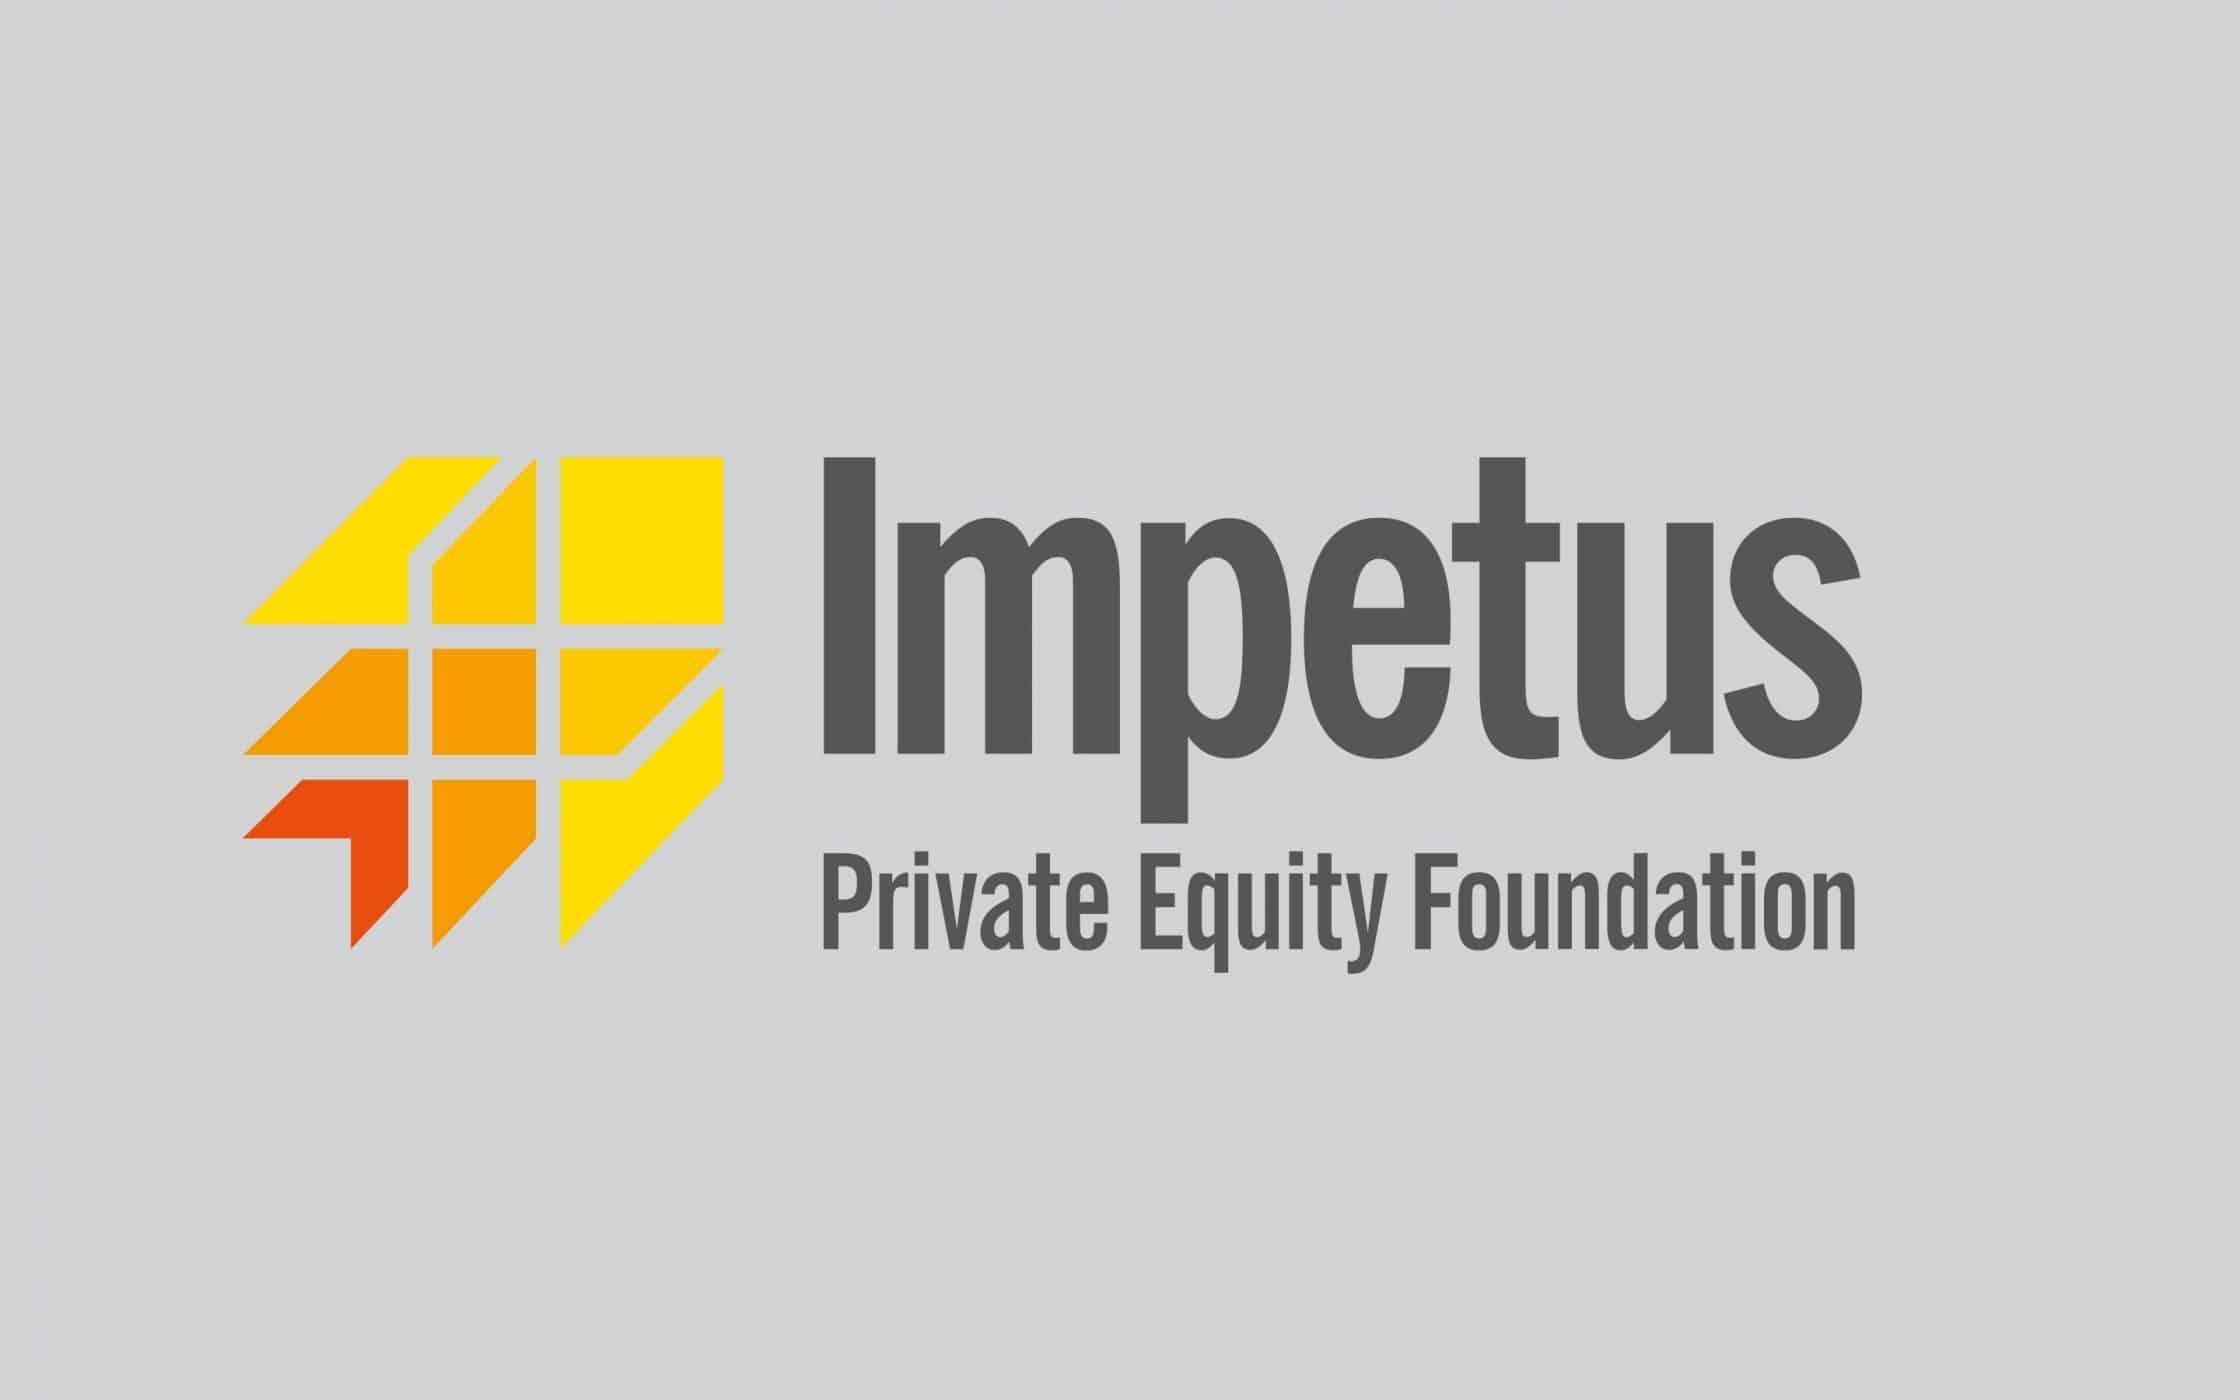 Impetus Merger Branding & Visual Identity by Fabrik Brands London